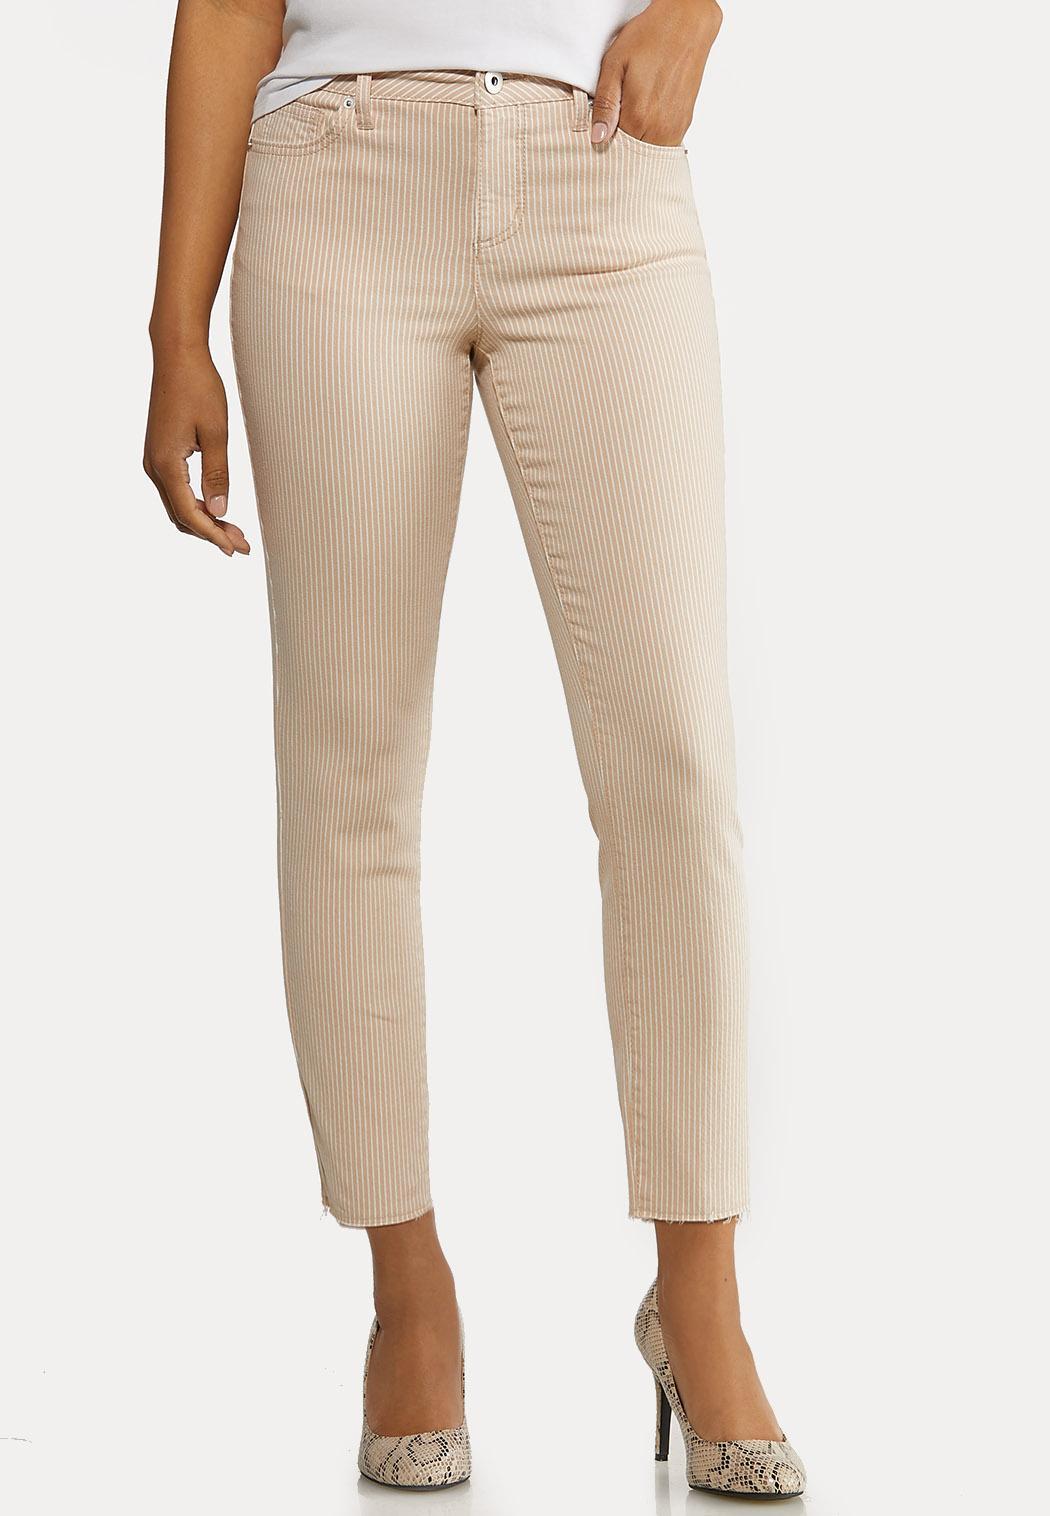 Neutral Stripe Ankle Jeans